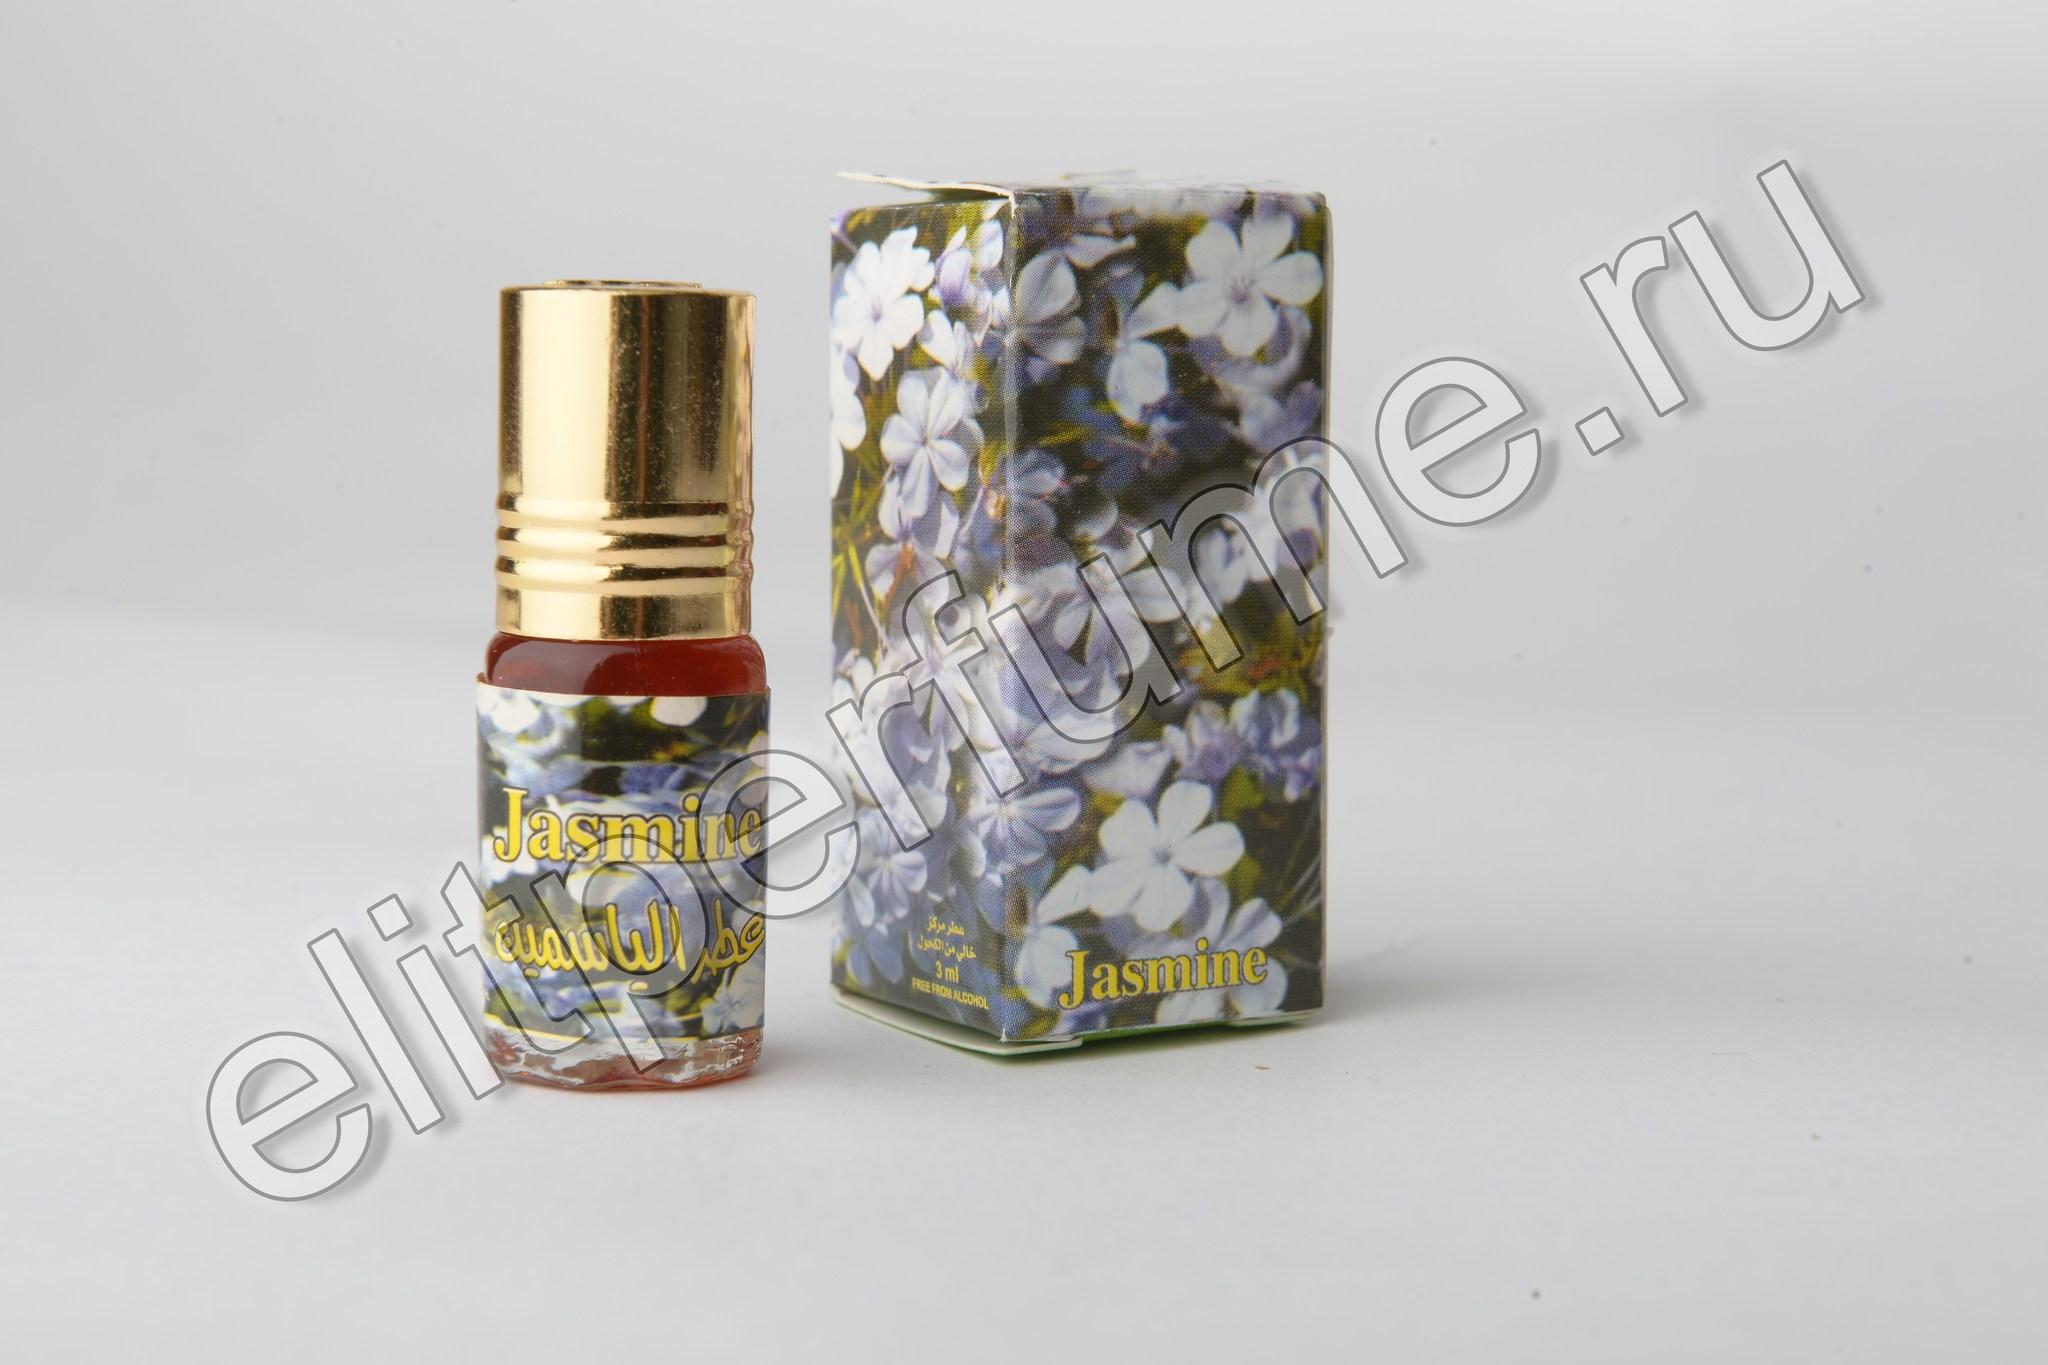 Jasmine  3 мл арабские масляные духи от Захра Zahra Perfumes